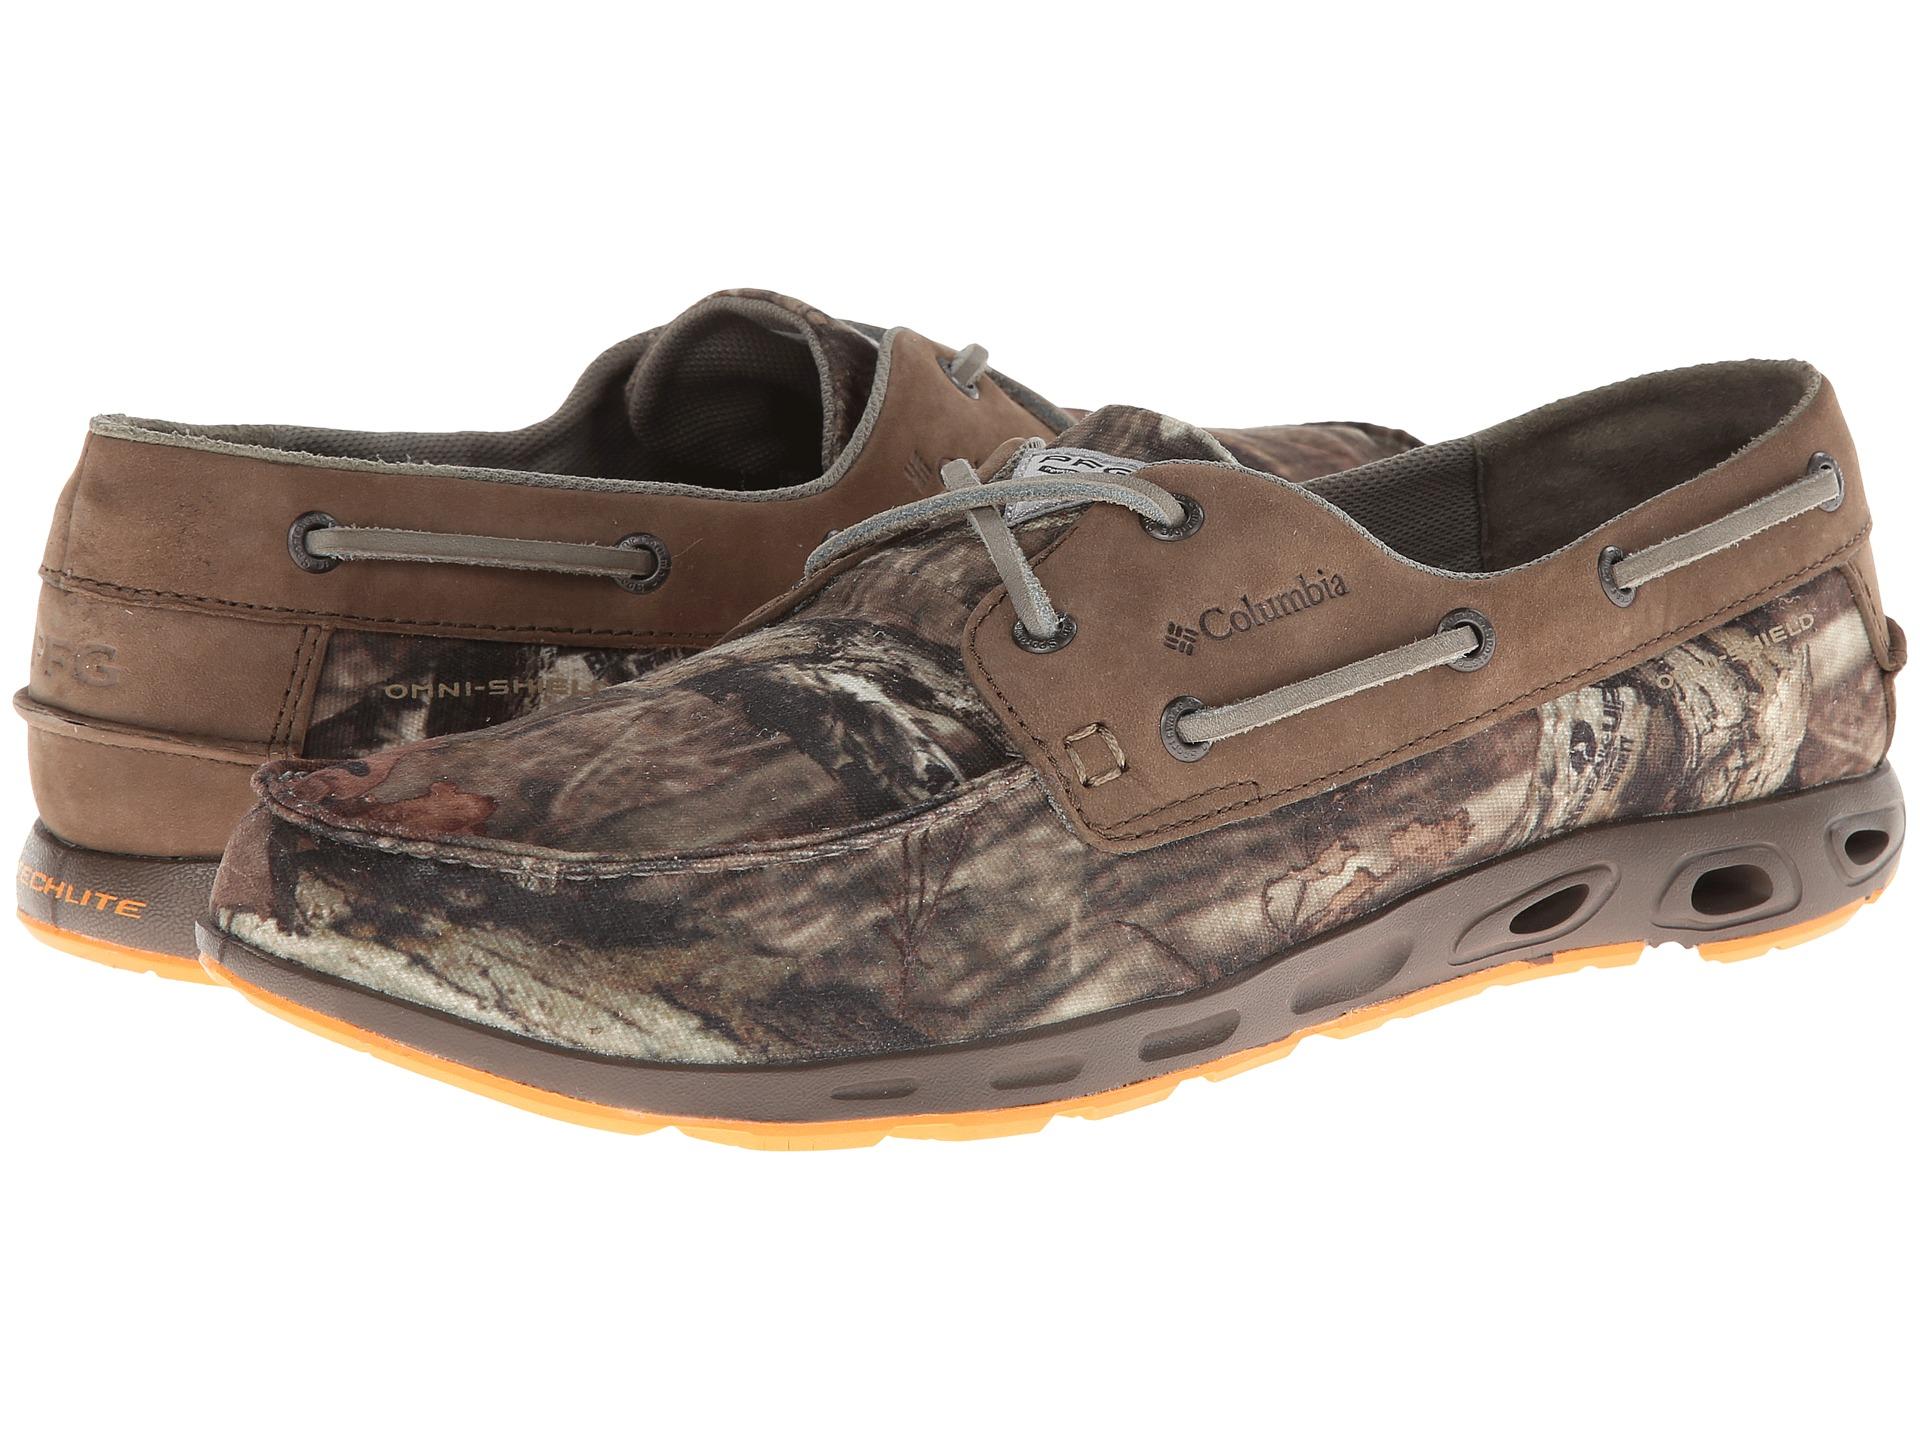 Columbia Vulc N Vent PFG Pro Boat Shoes